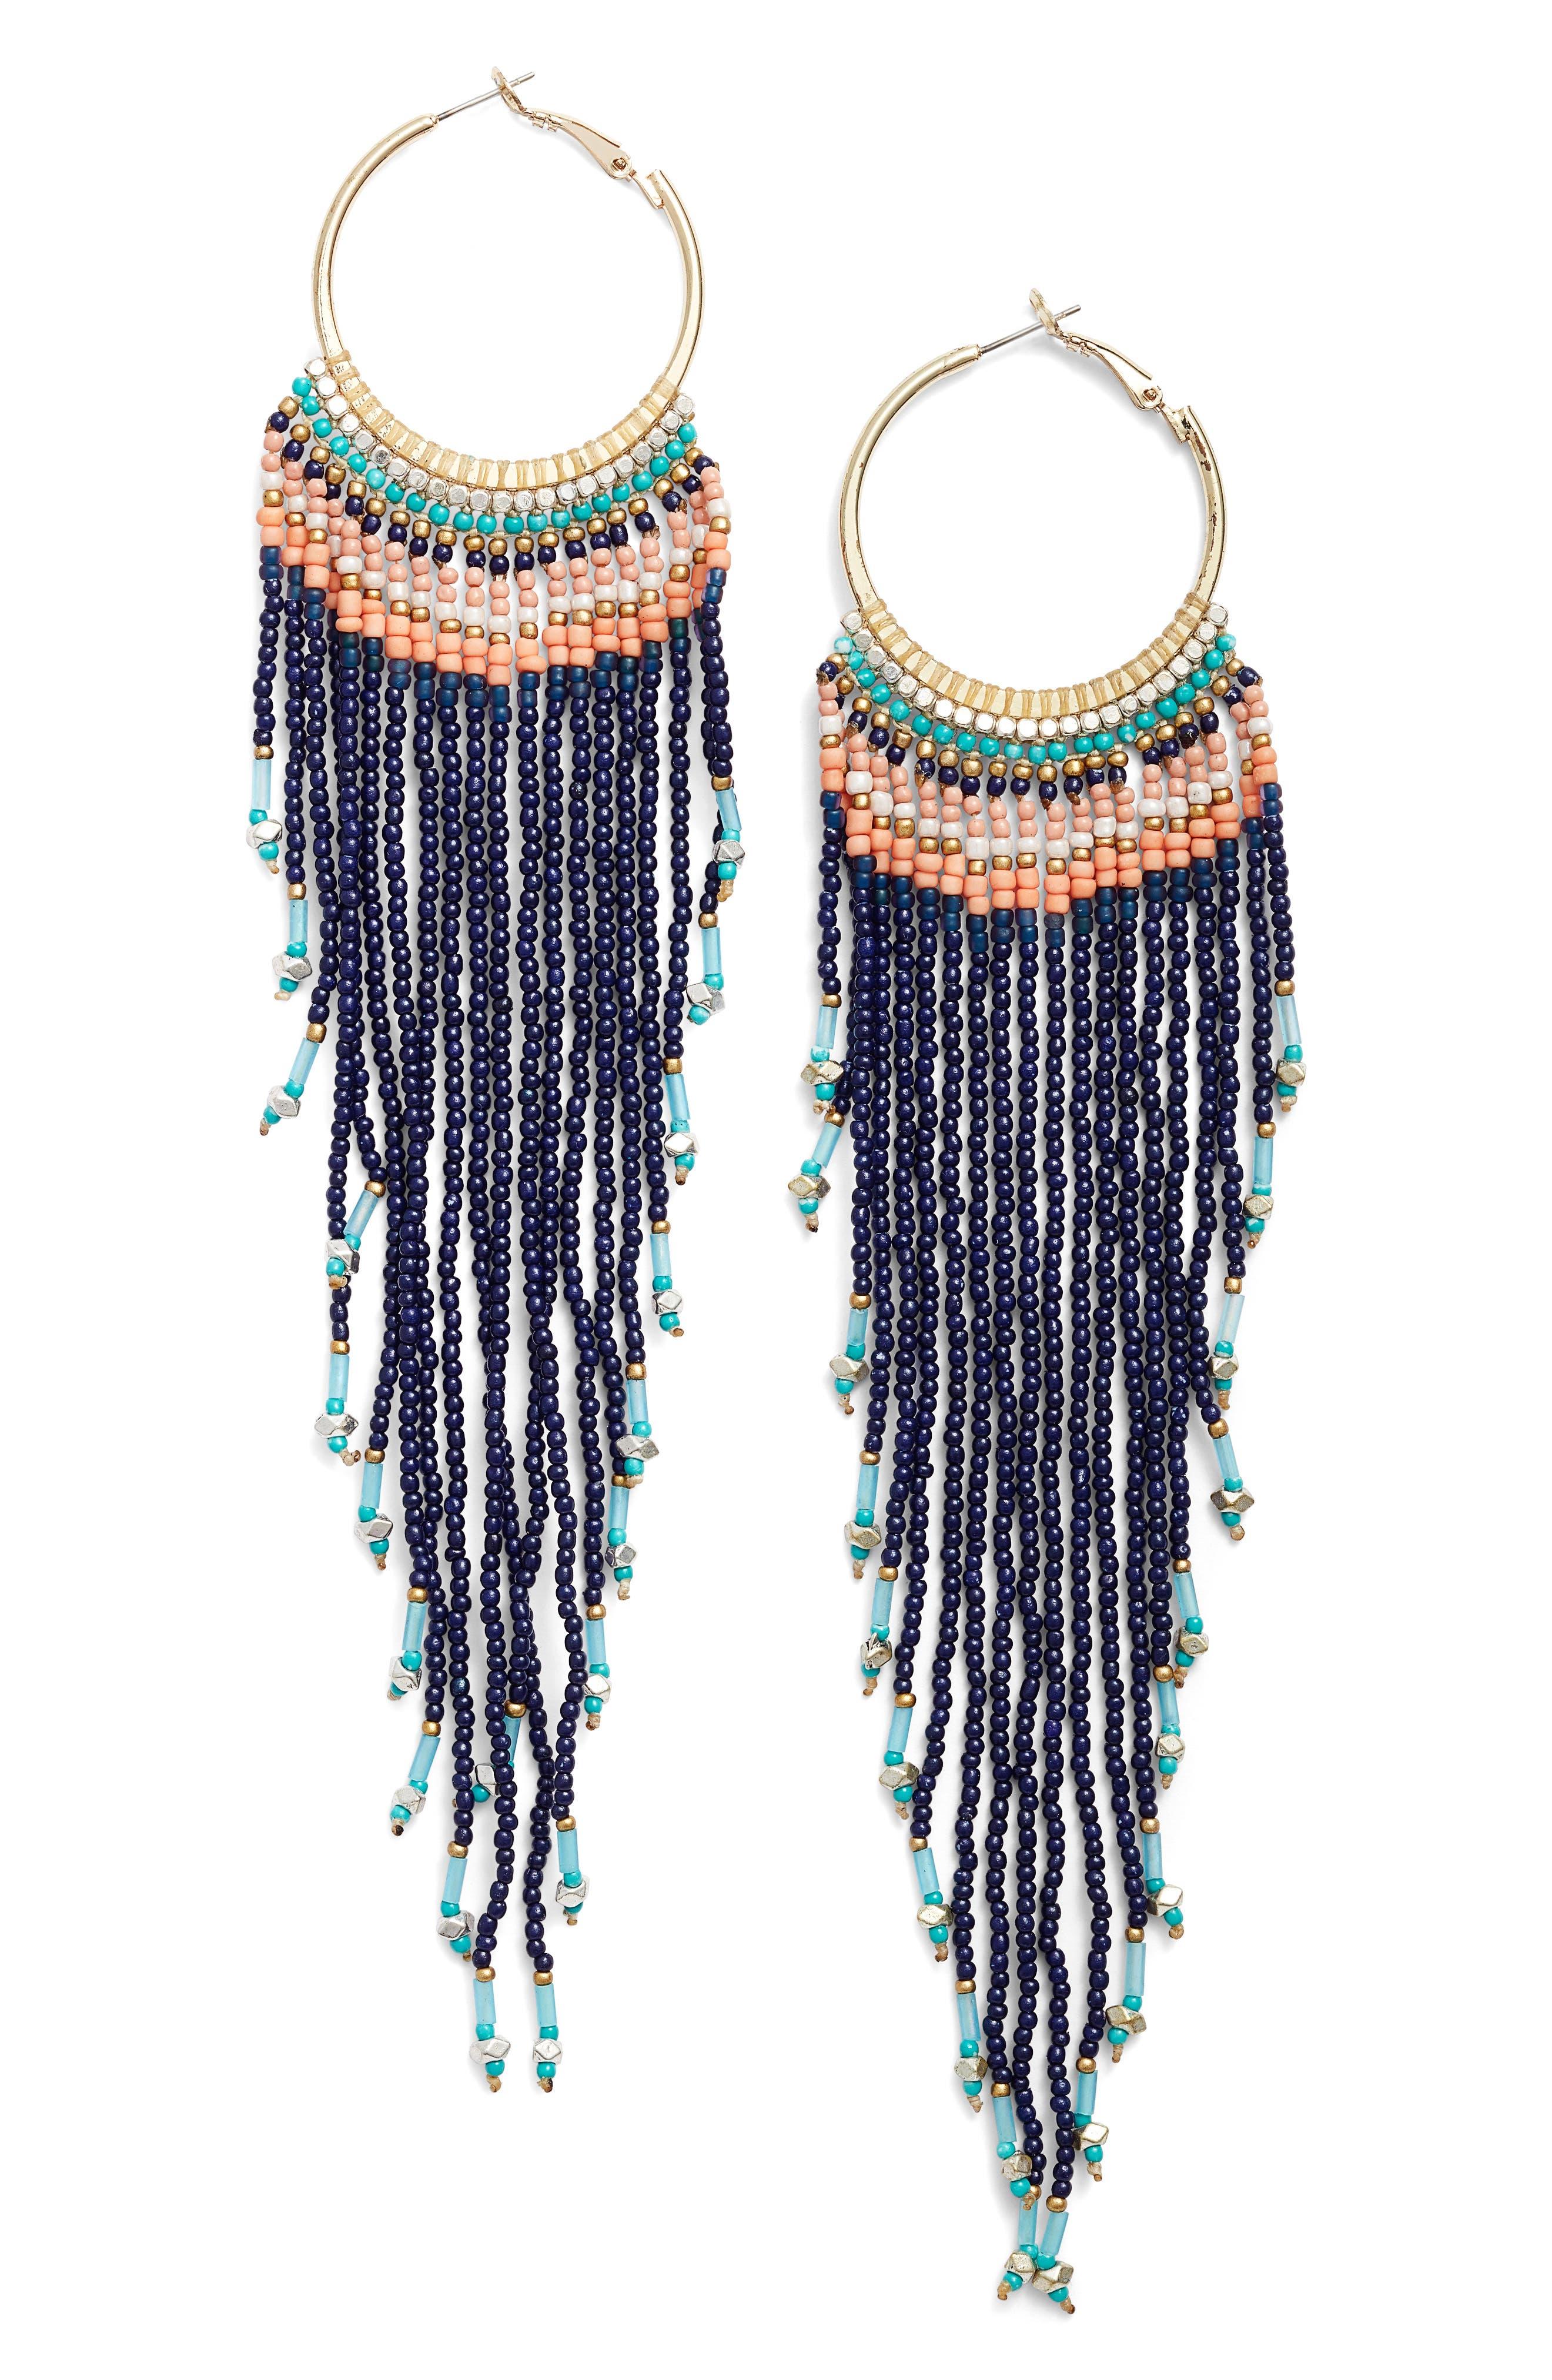 Nakamol Design Aban Beaded Tassel Hoop Earrings